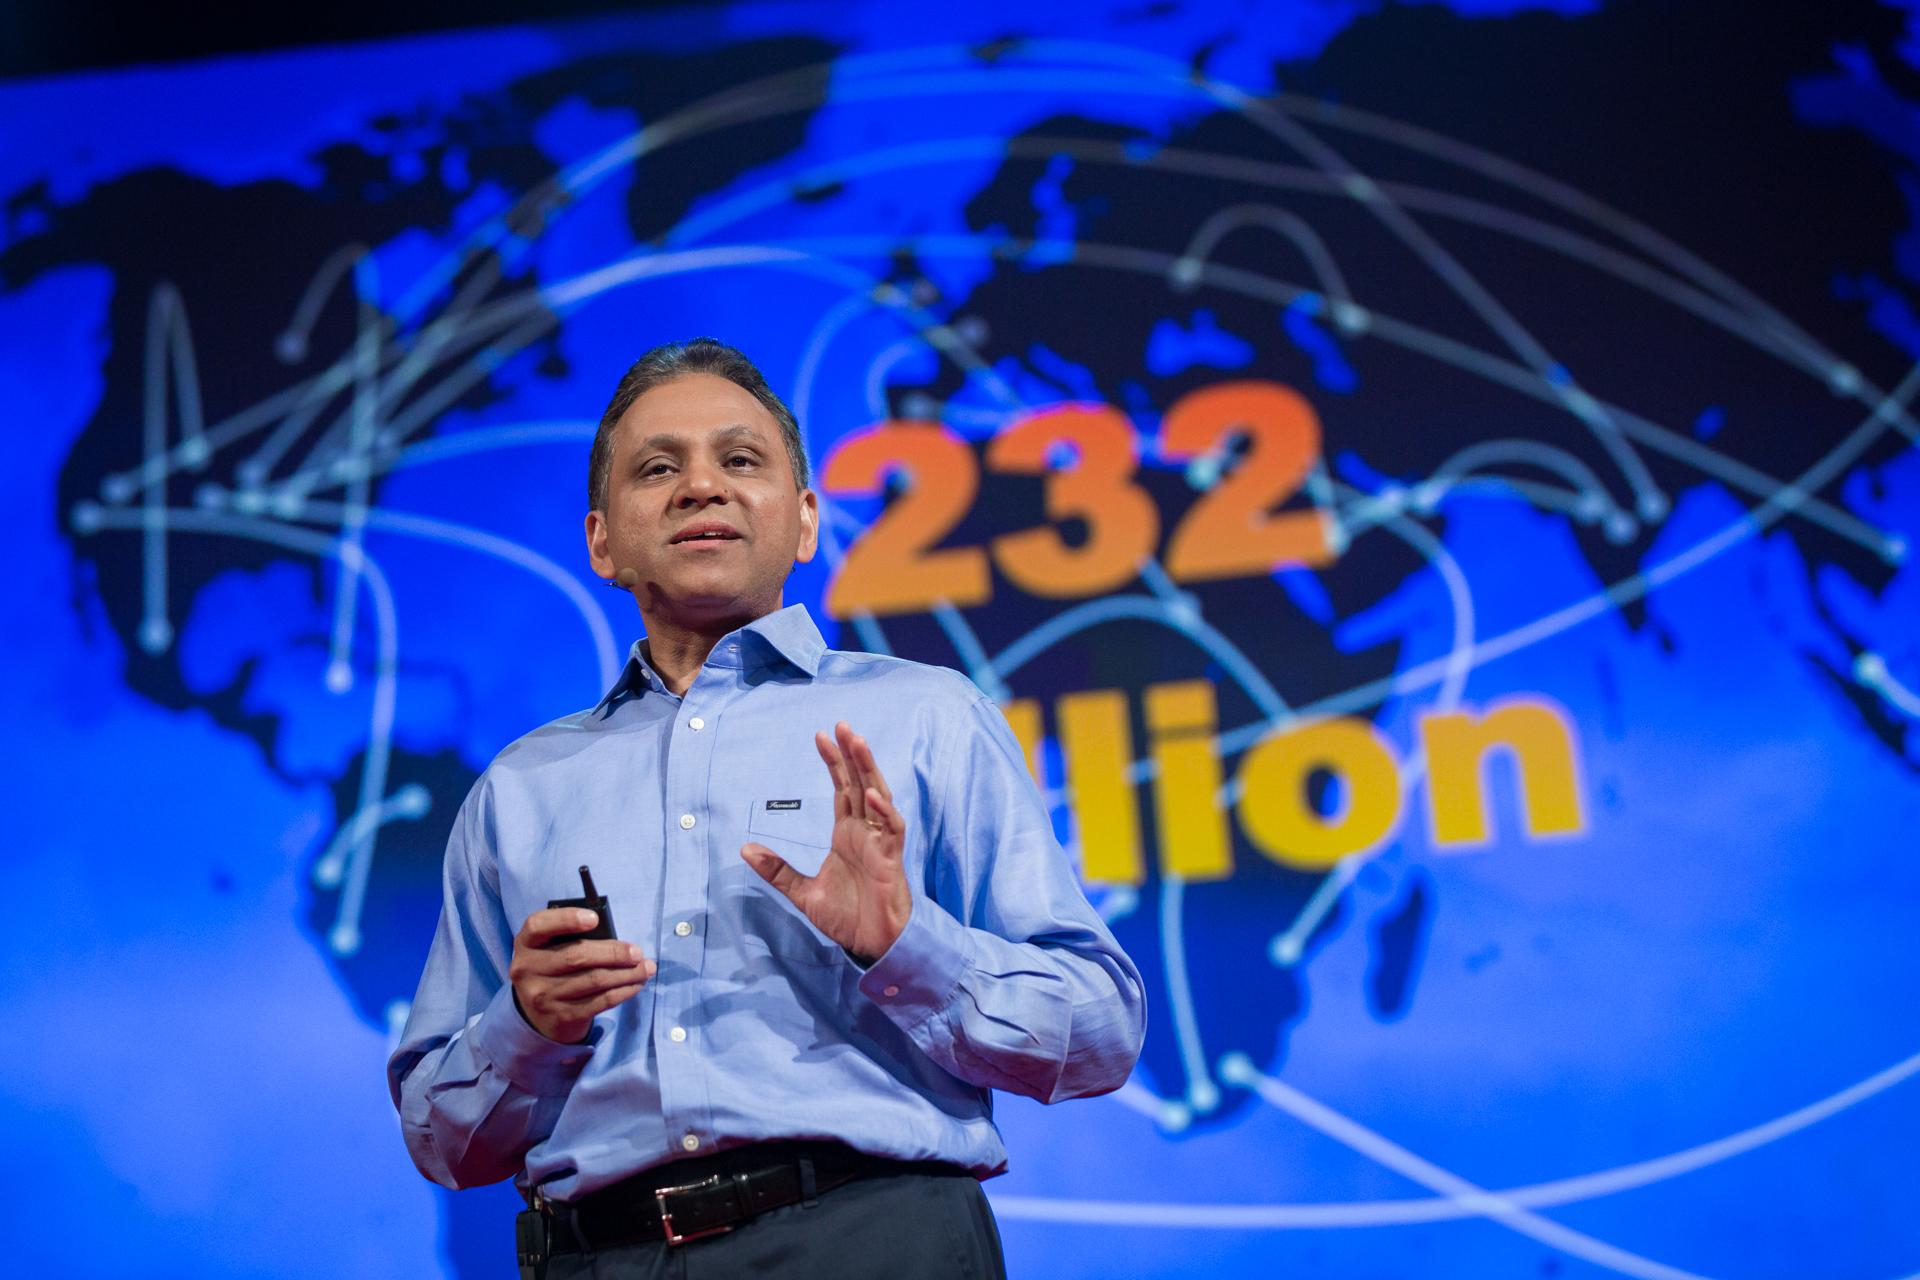 Dilip Ratha speaking at TEDGlobal 2014.